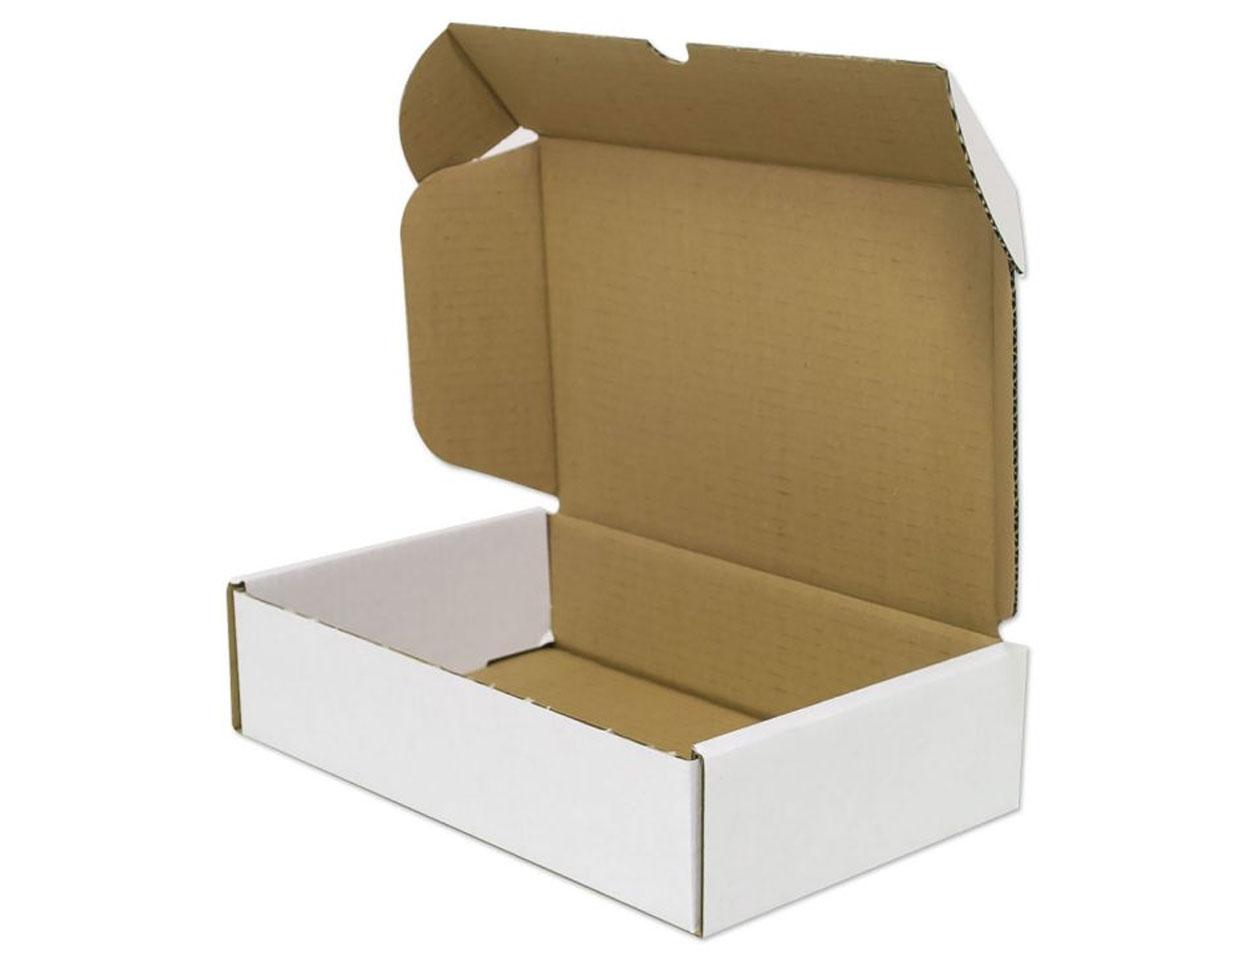 2000 x warensendung kartons 250 x 173 x 100 mm post paket faltschachtel op 280w ebay. Black Bedroom Furniture Sets. Home Design Ideas